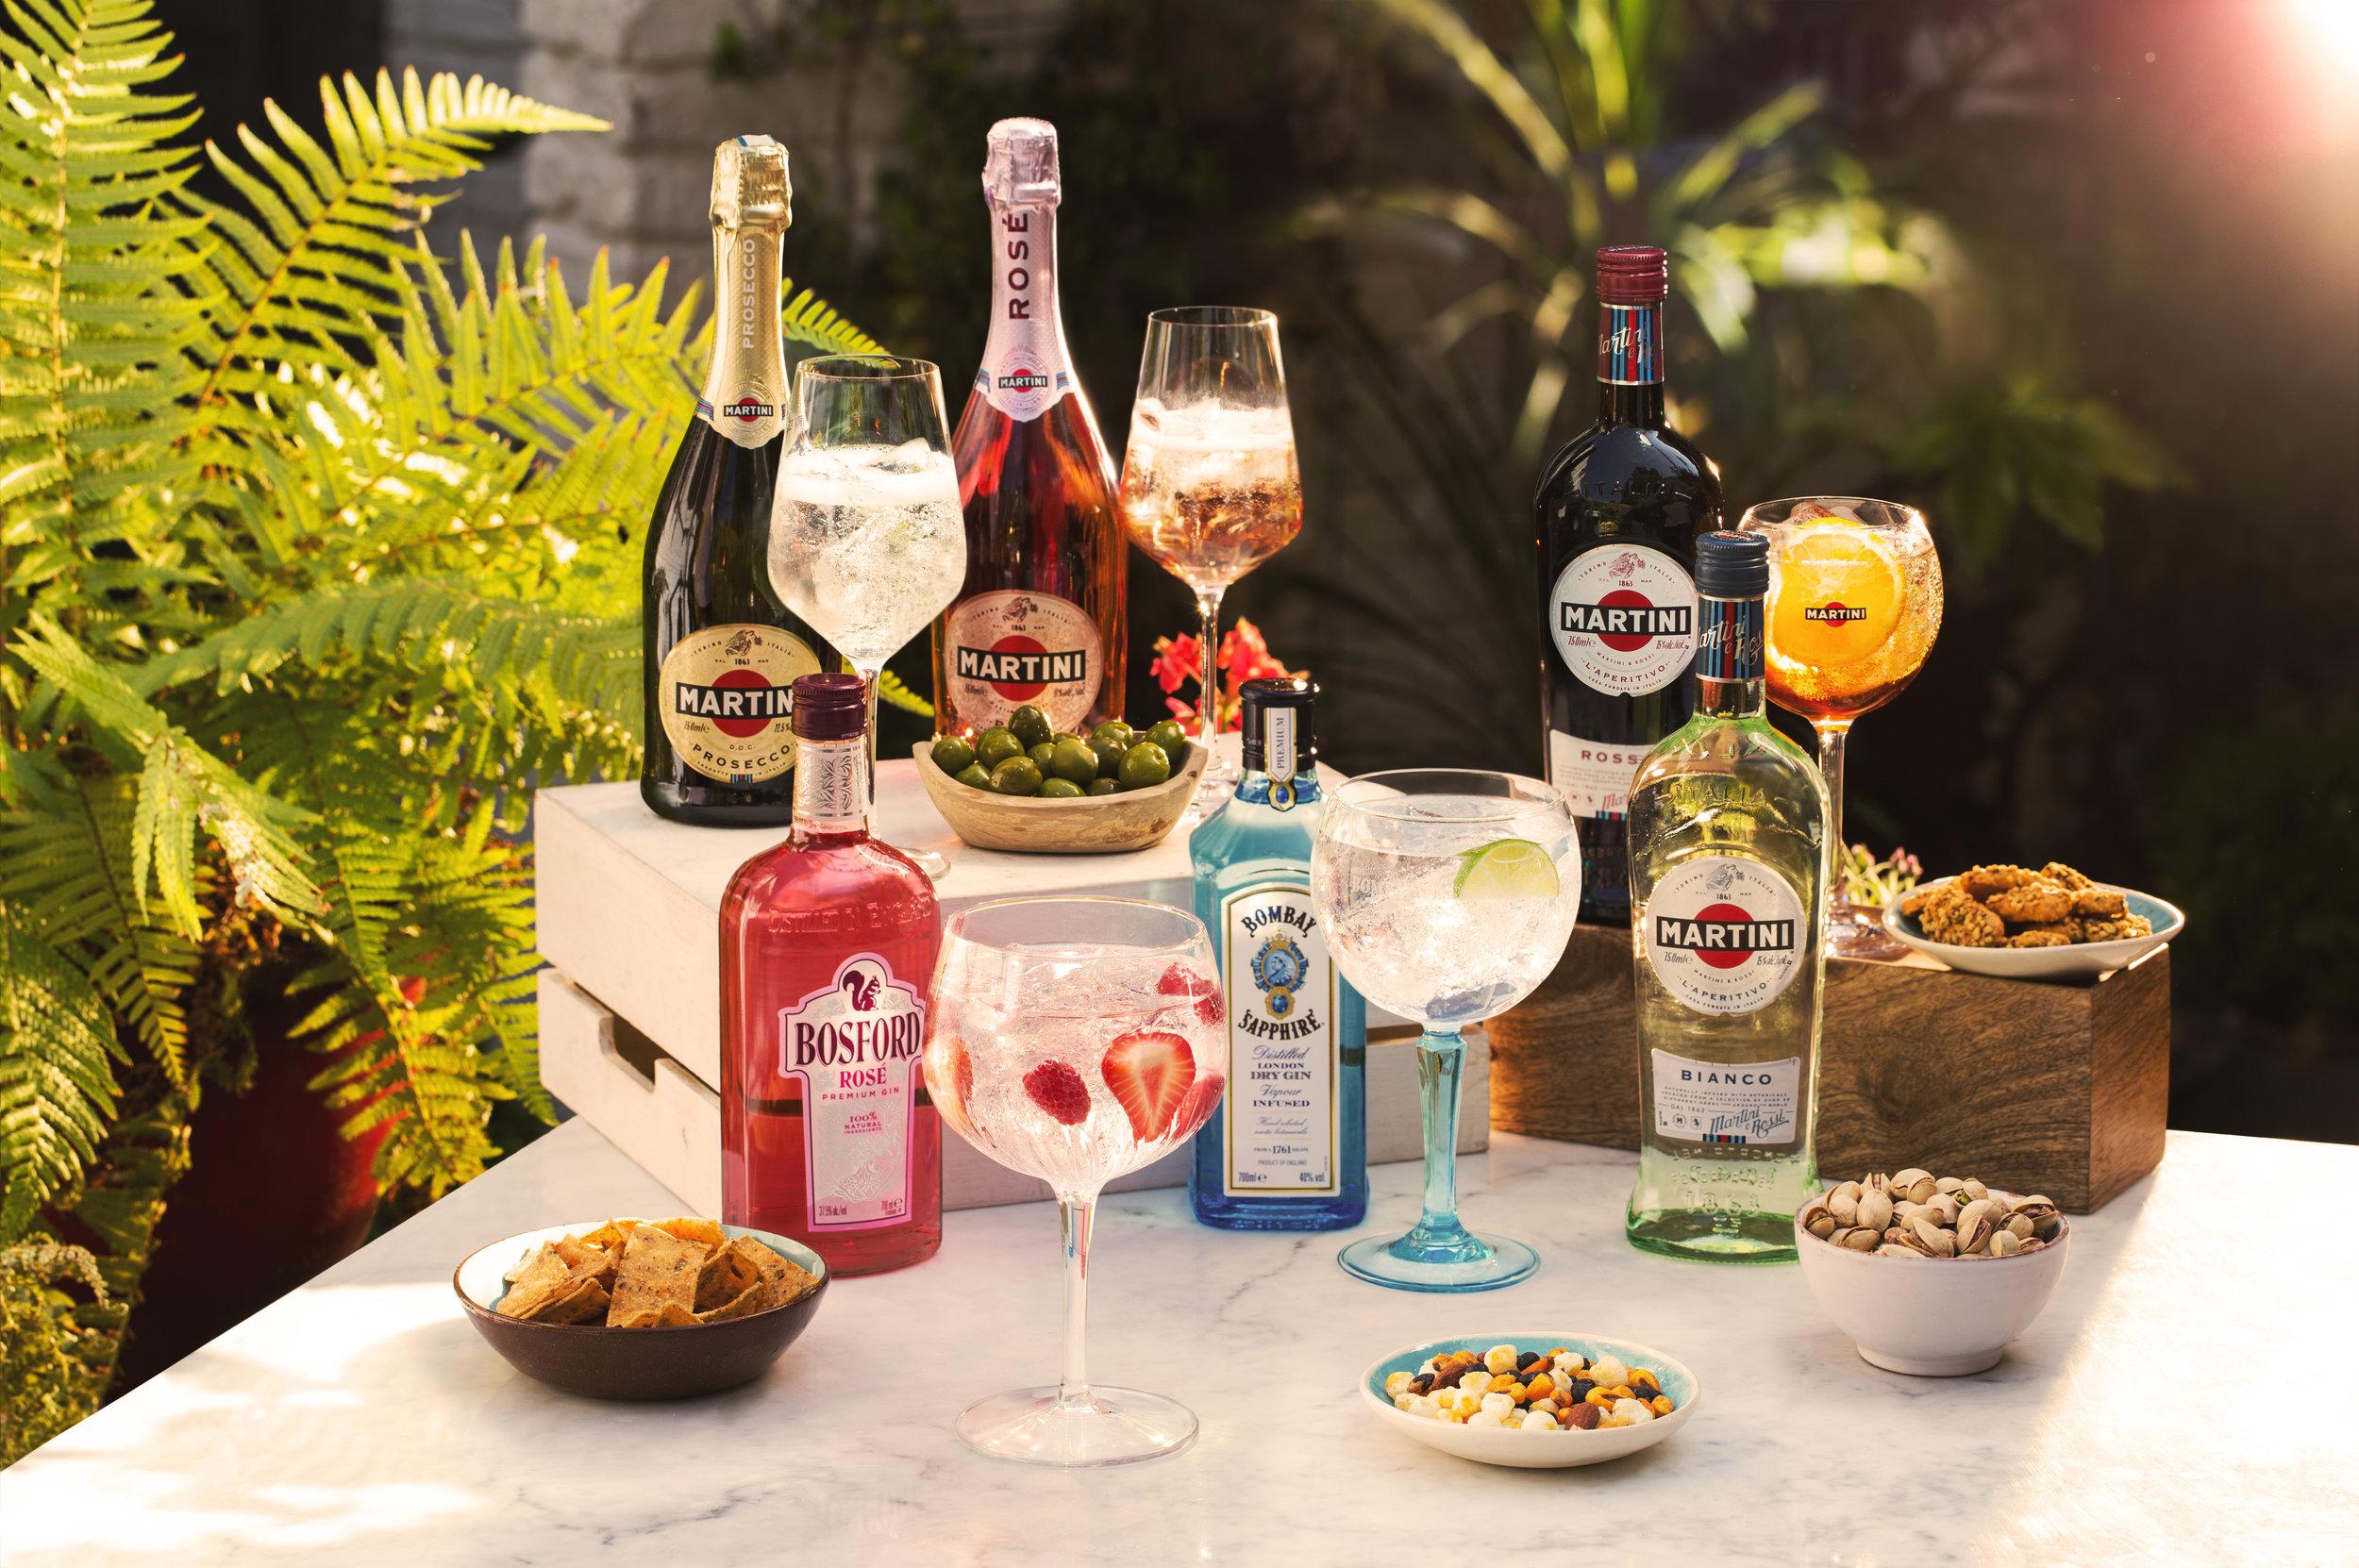 Bacardi_AperitivoMoment_Drinks+Bottles+Food_Good_lg.jpg